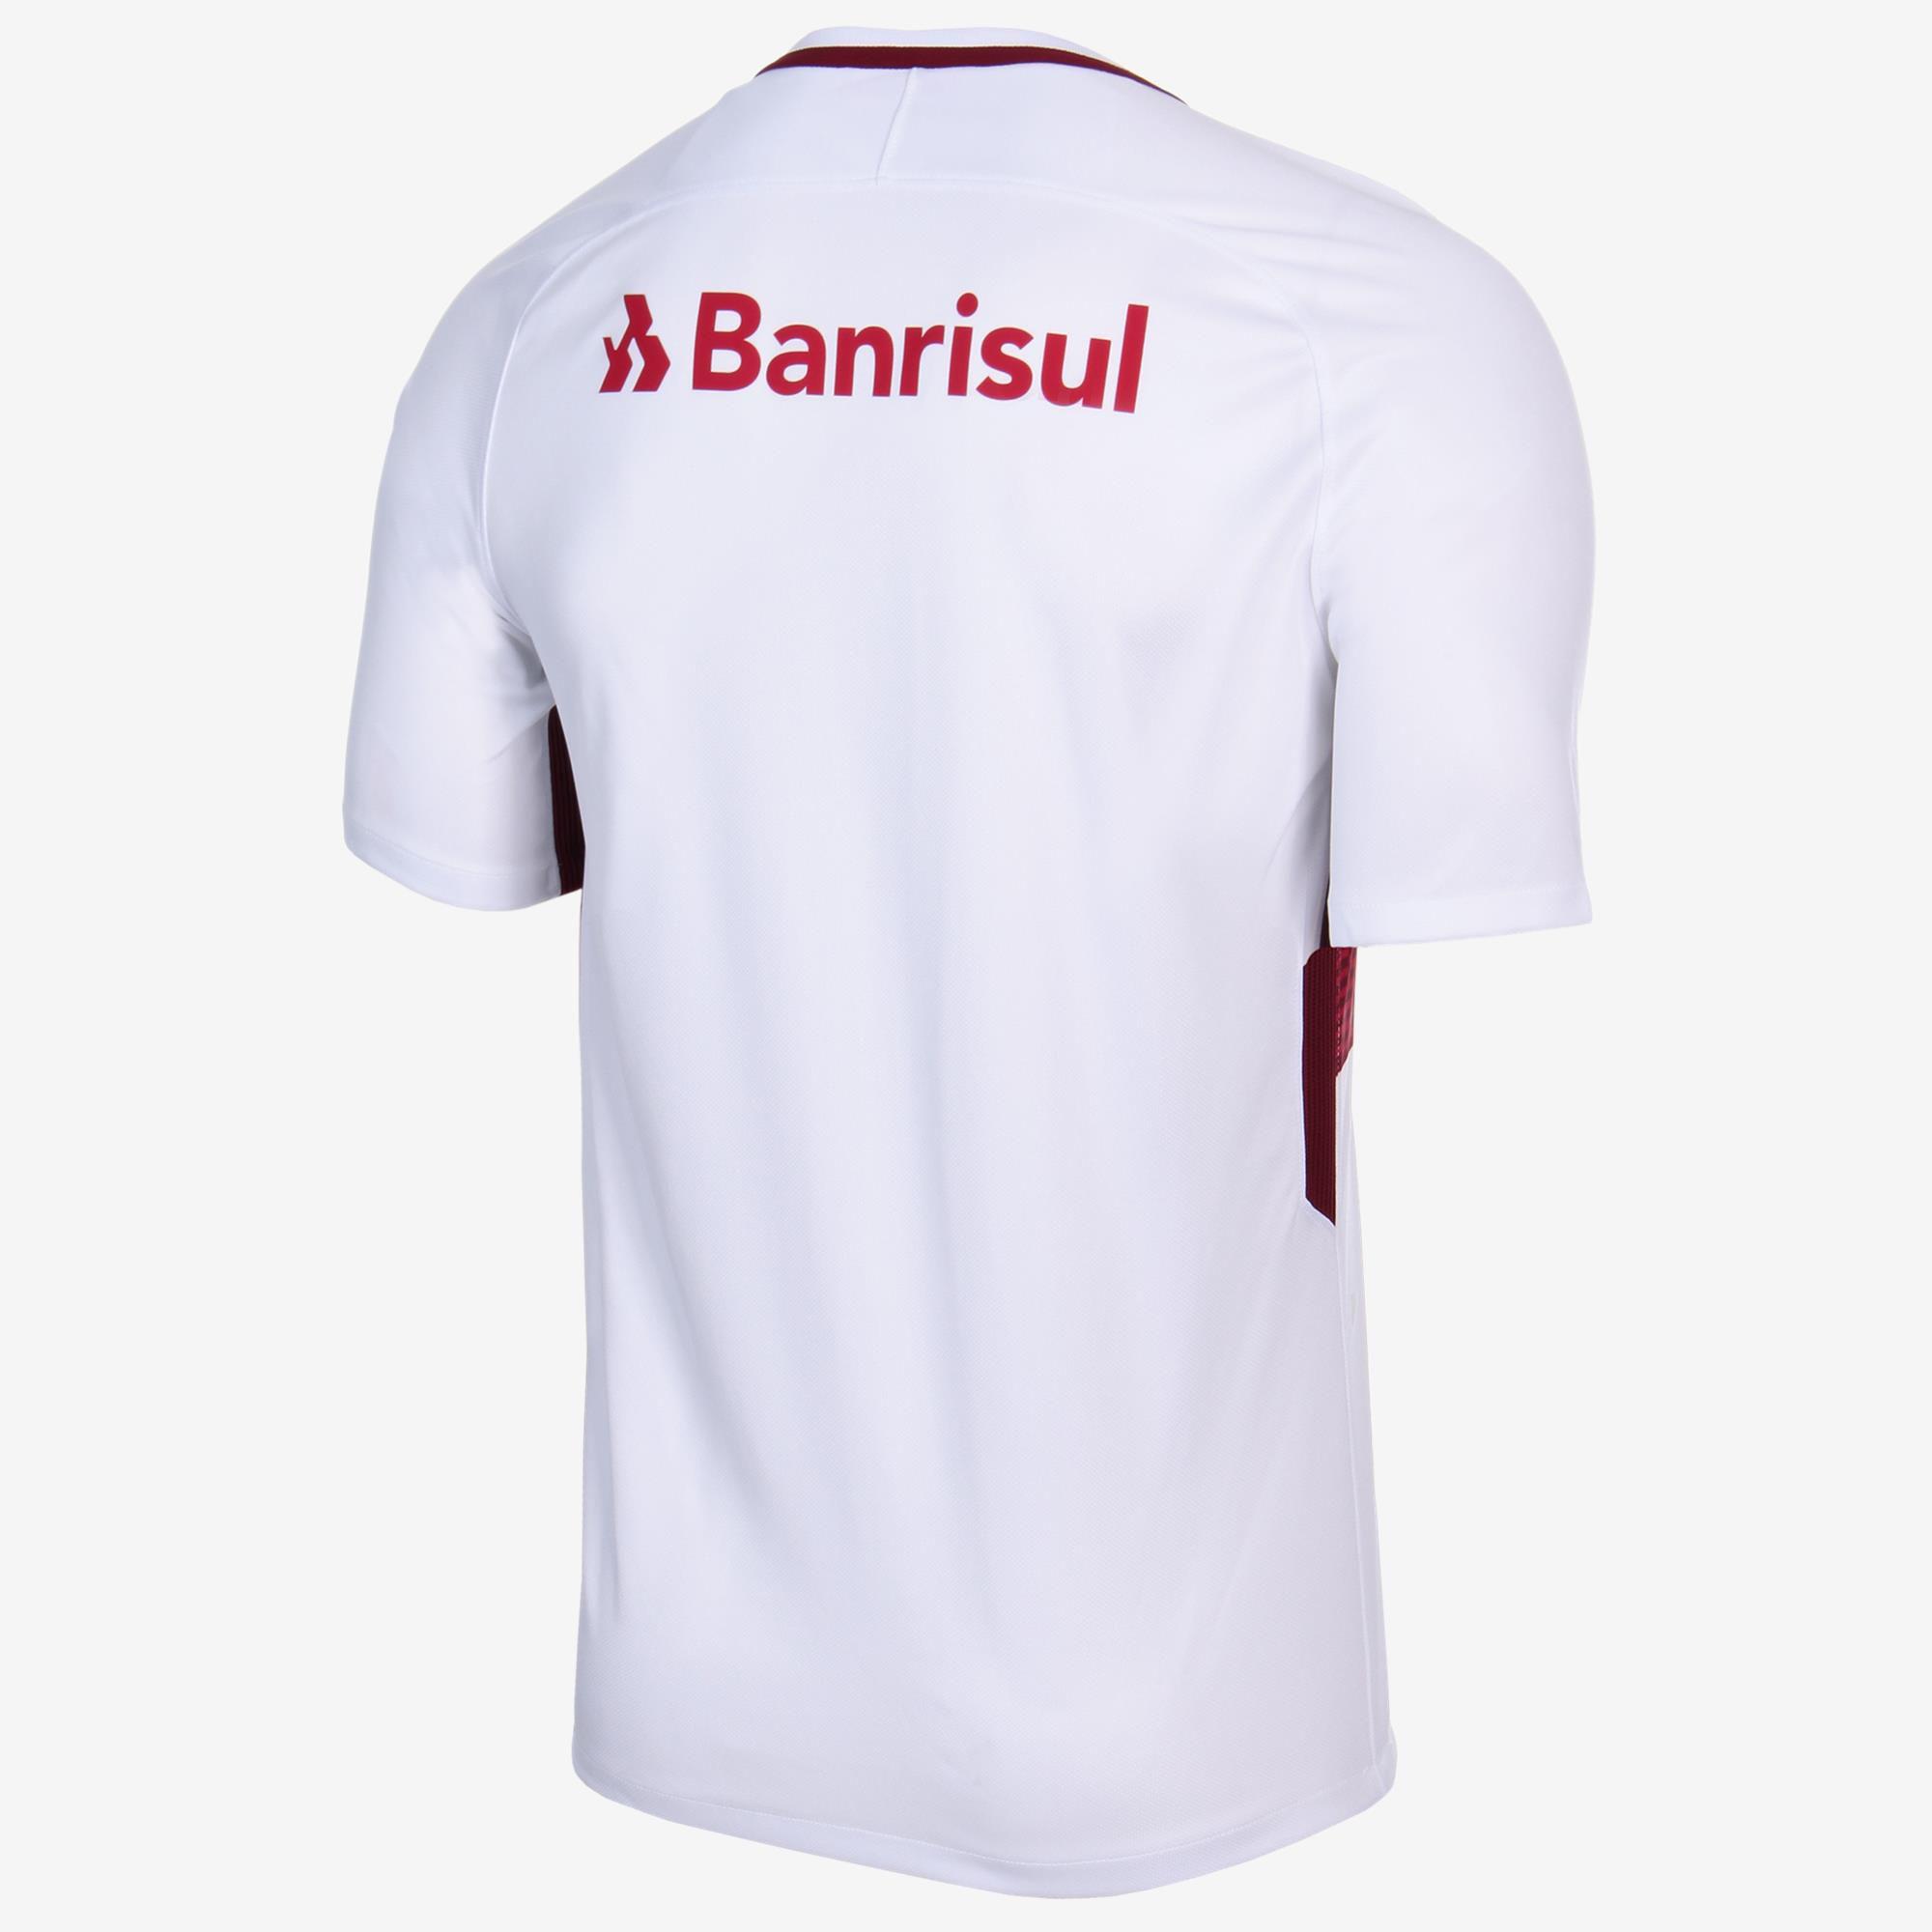 cbf75864827d5 Camisa Nike Internacional Ii 17 18 S n° Torcedor - BRACIA SHOP  Loja ...